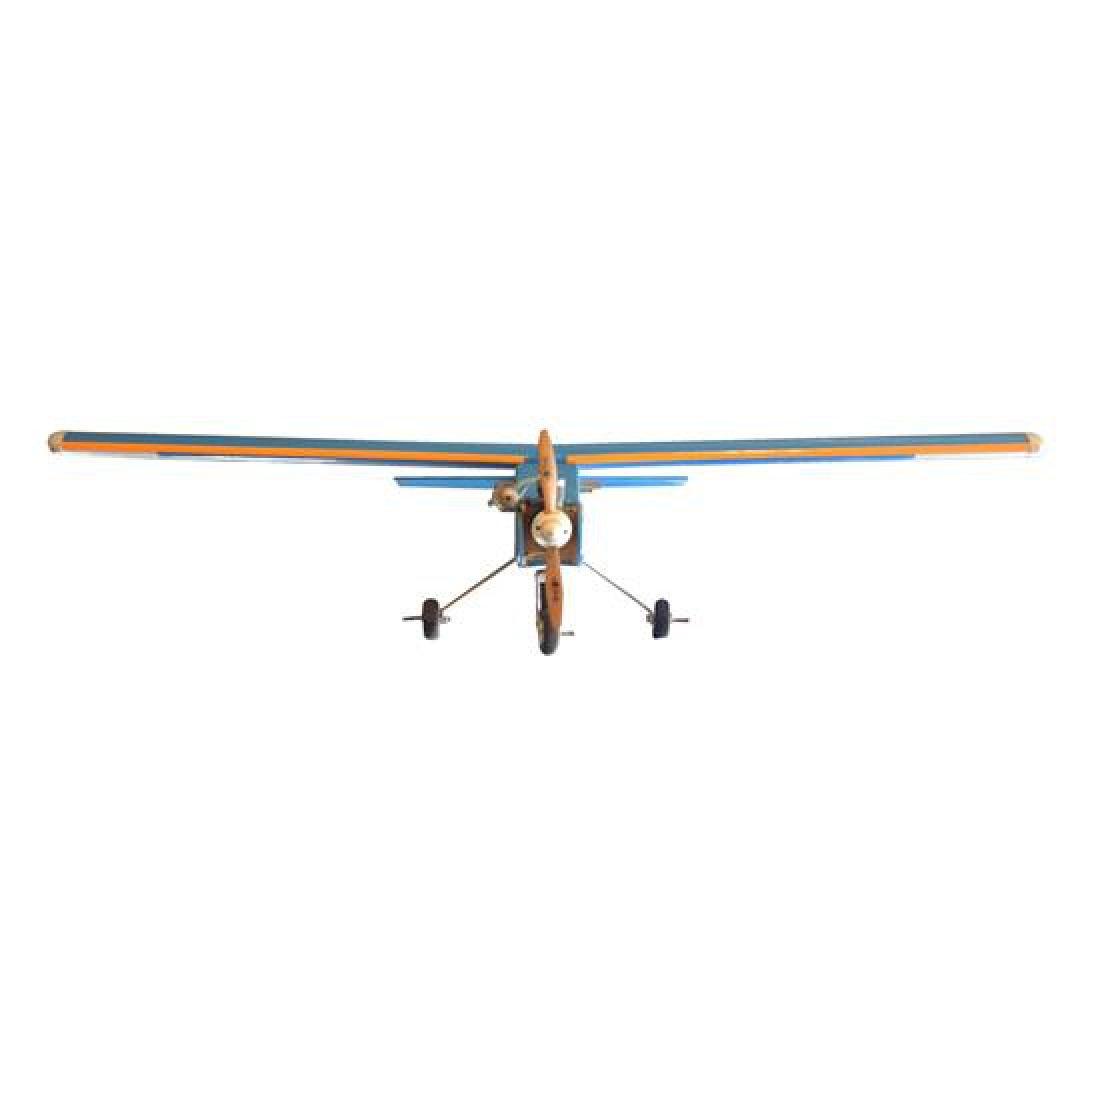 "A Remote Control Airplane 48"" W x 56"" D x 20"" H - 2"